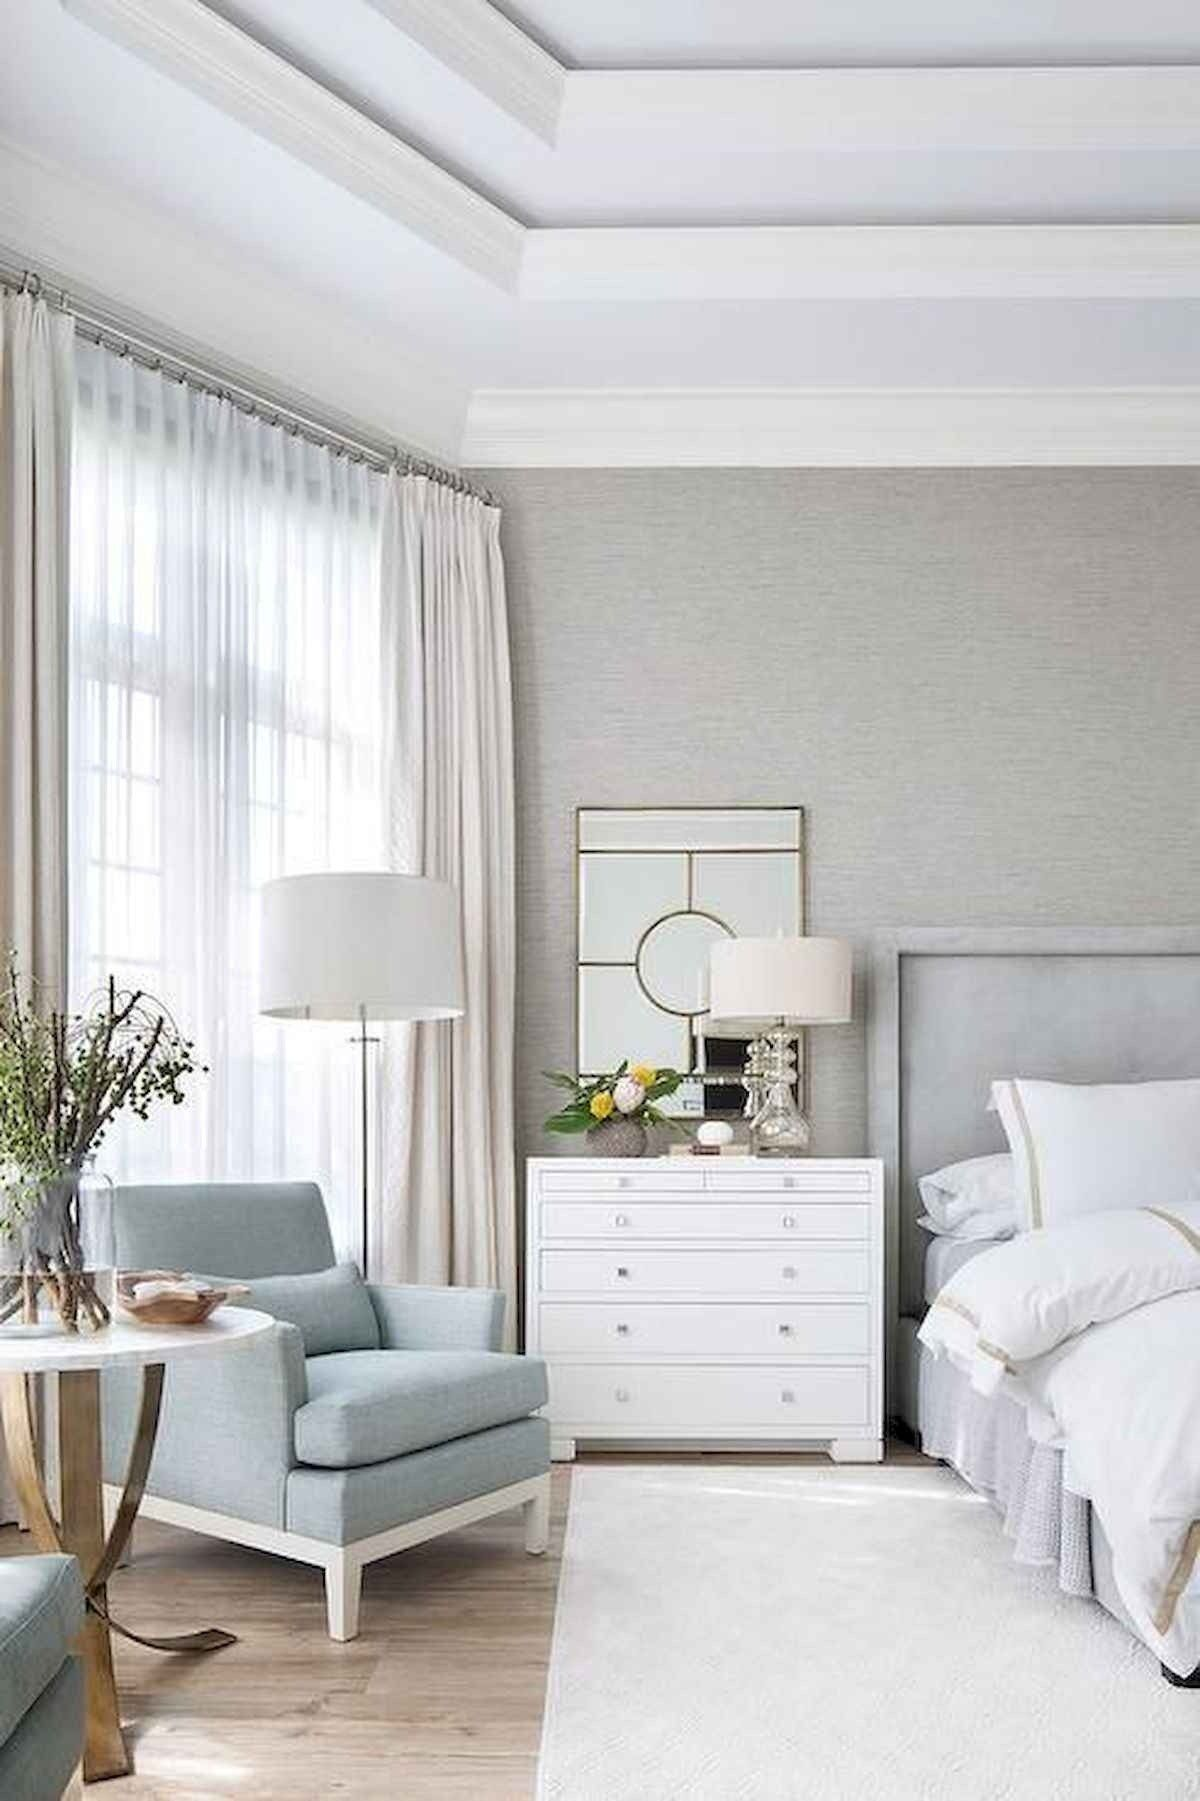 120 Awesome Farmhouse Master Bedroom Decor Ideas Master Bedrooms Decor Home Decor Bedroom Bedroom Interior